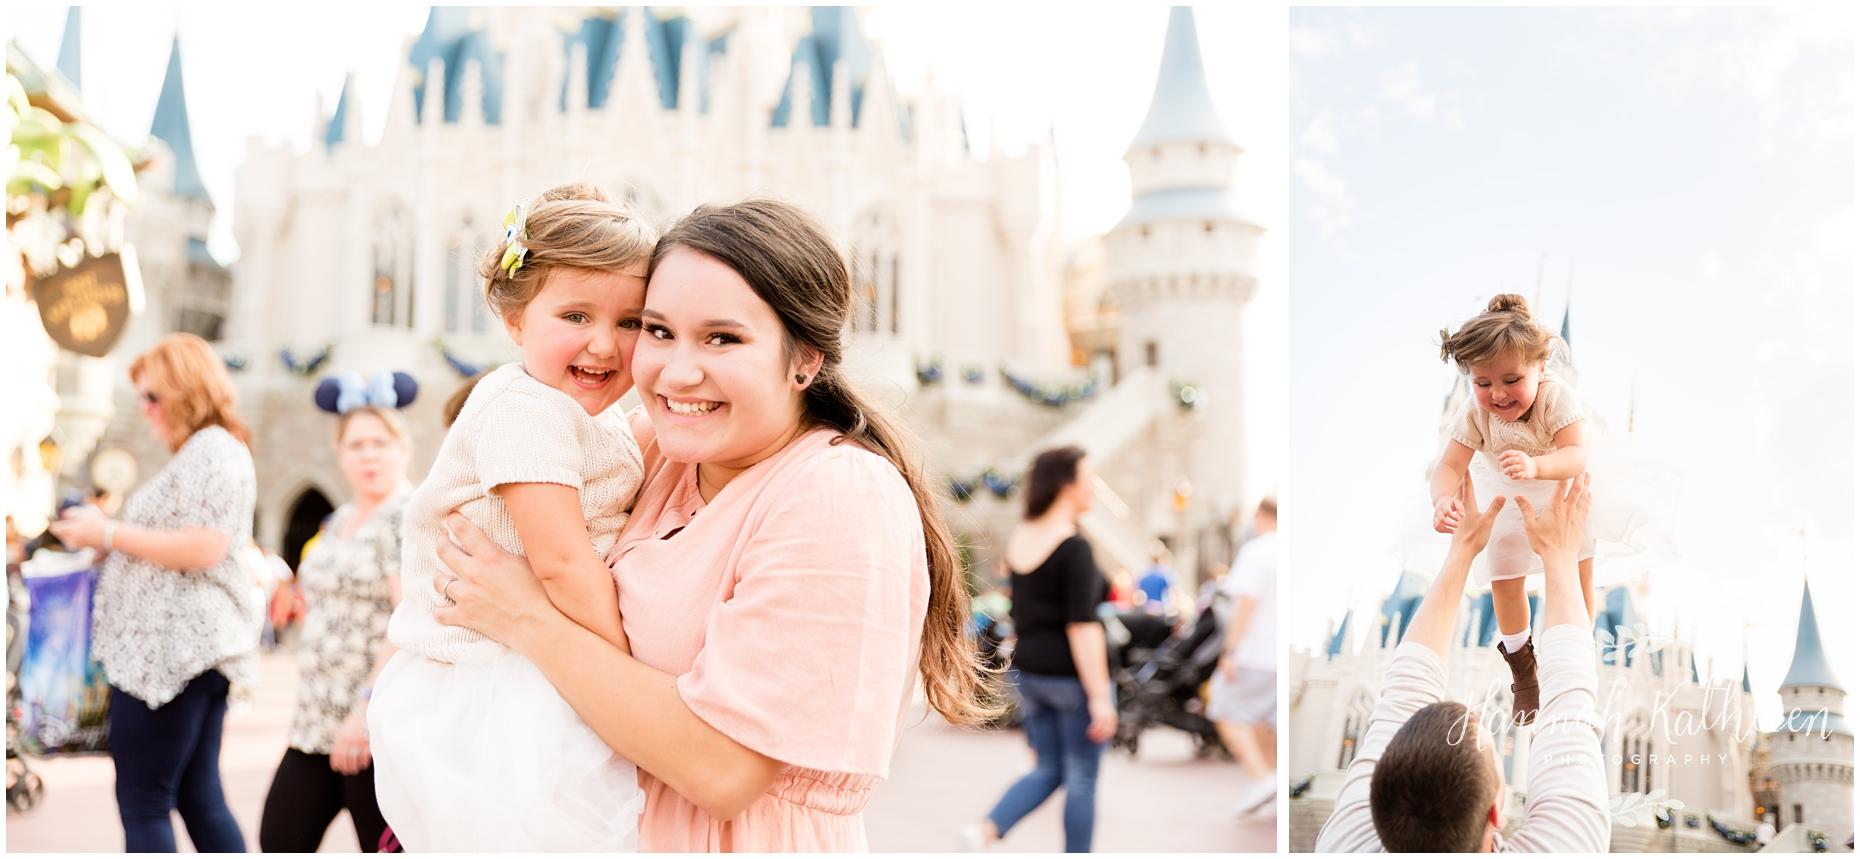 Goldsmith_Magic_Kingdom_Disney_World_Family_Photography